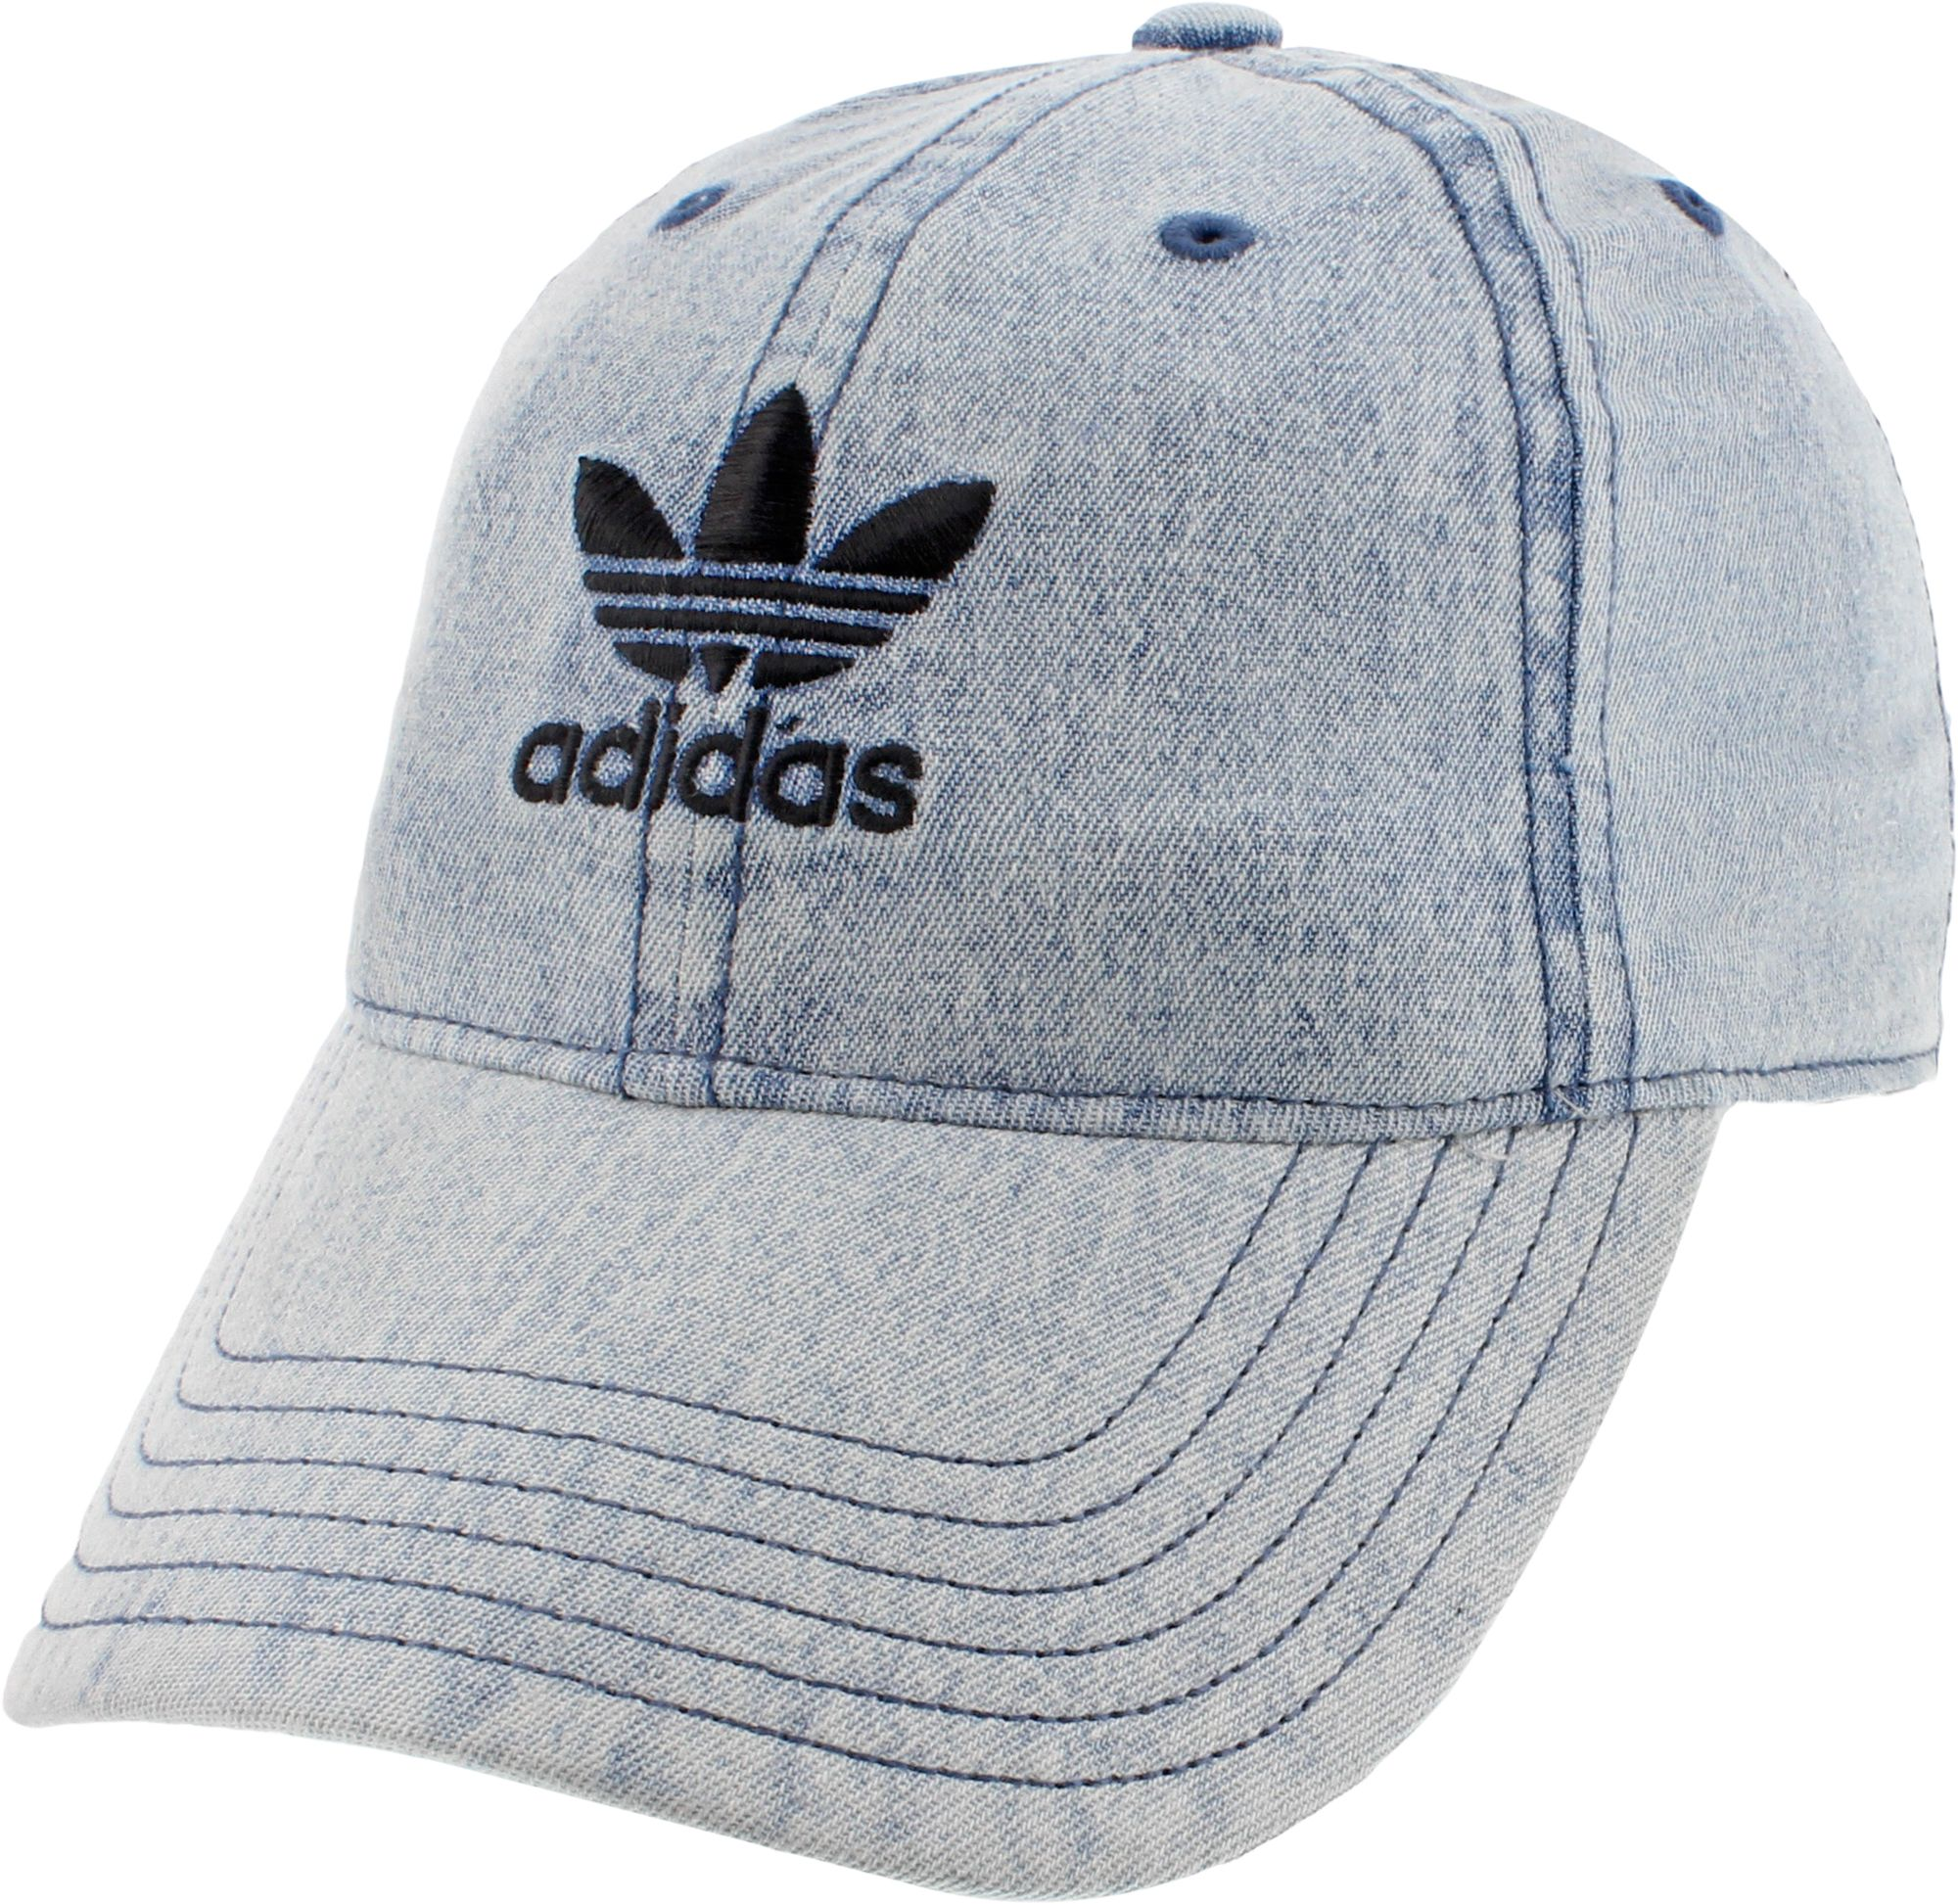 women u0027s hats baseball caps winter hats u0026 more u0027s sporting